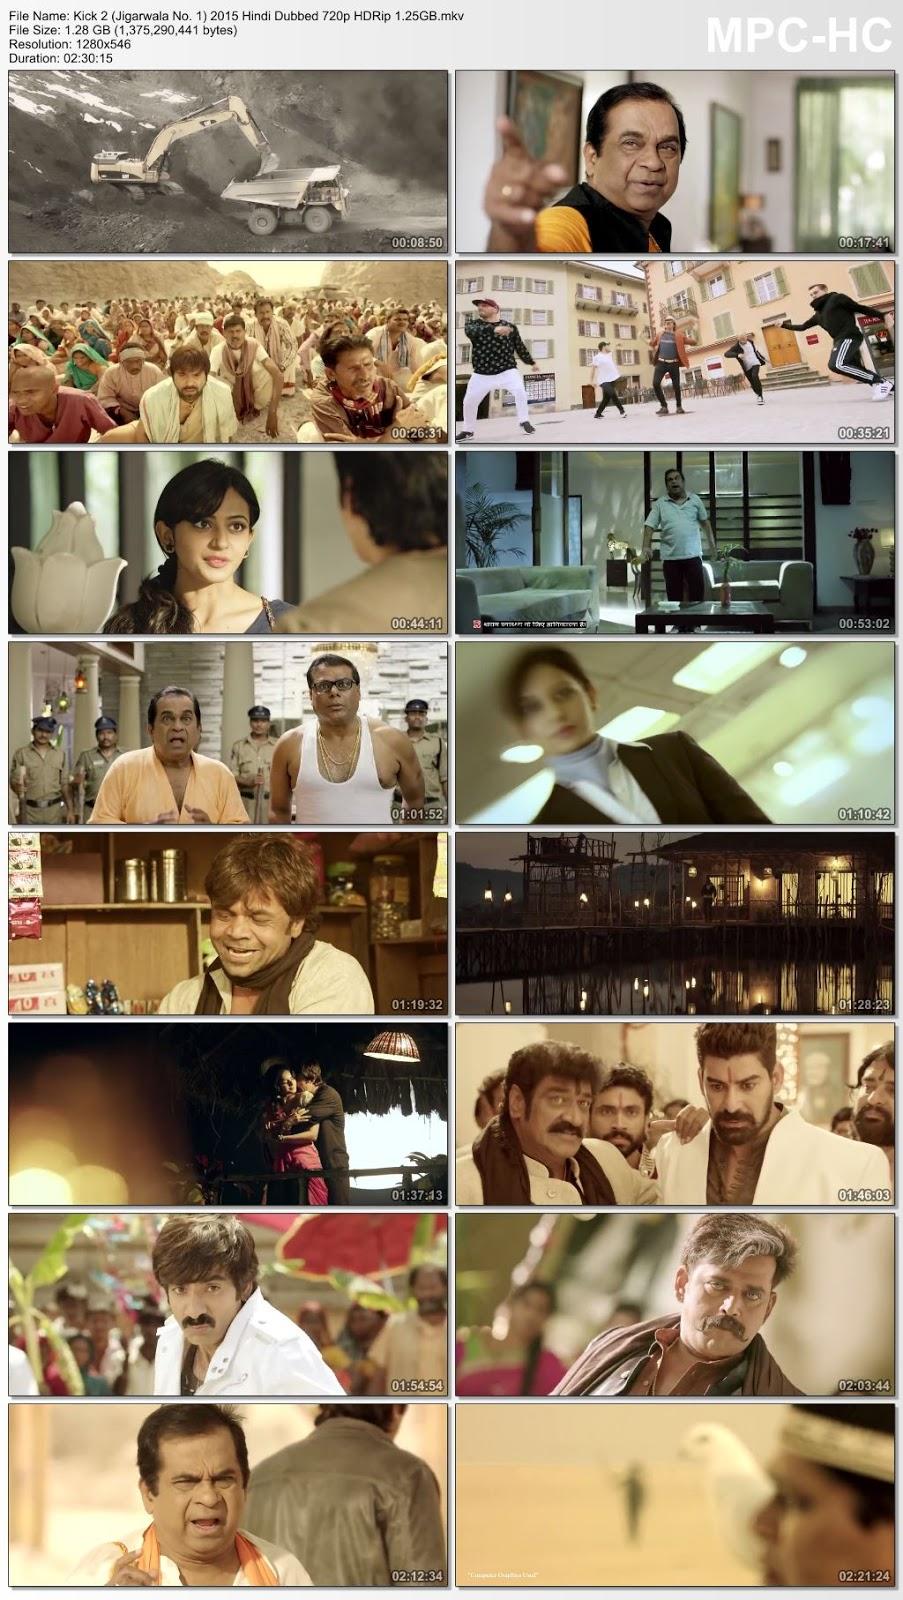 Kick 2 (2015) Hindi Dubbed 480p HDRip 450MB Desirehub